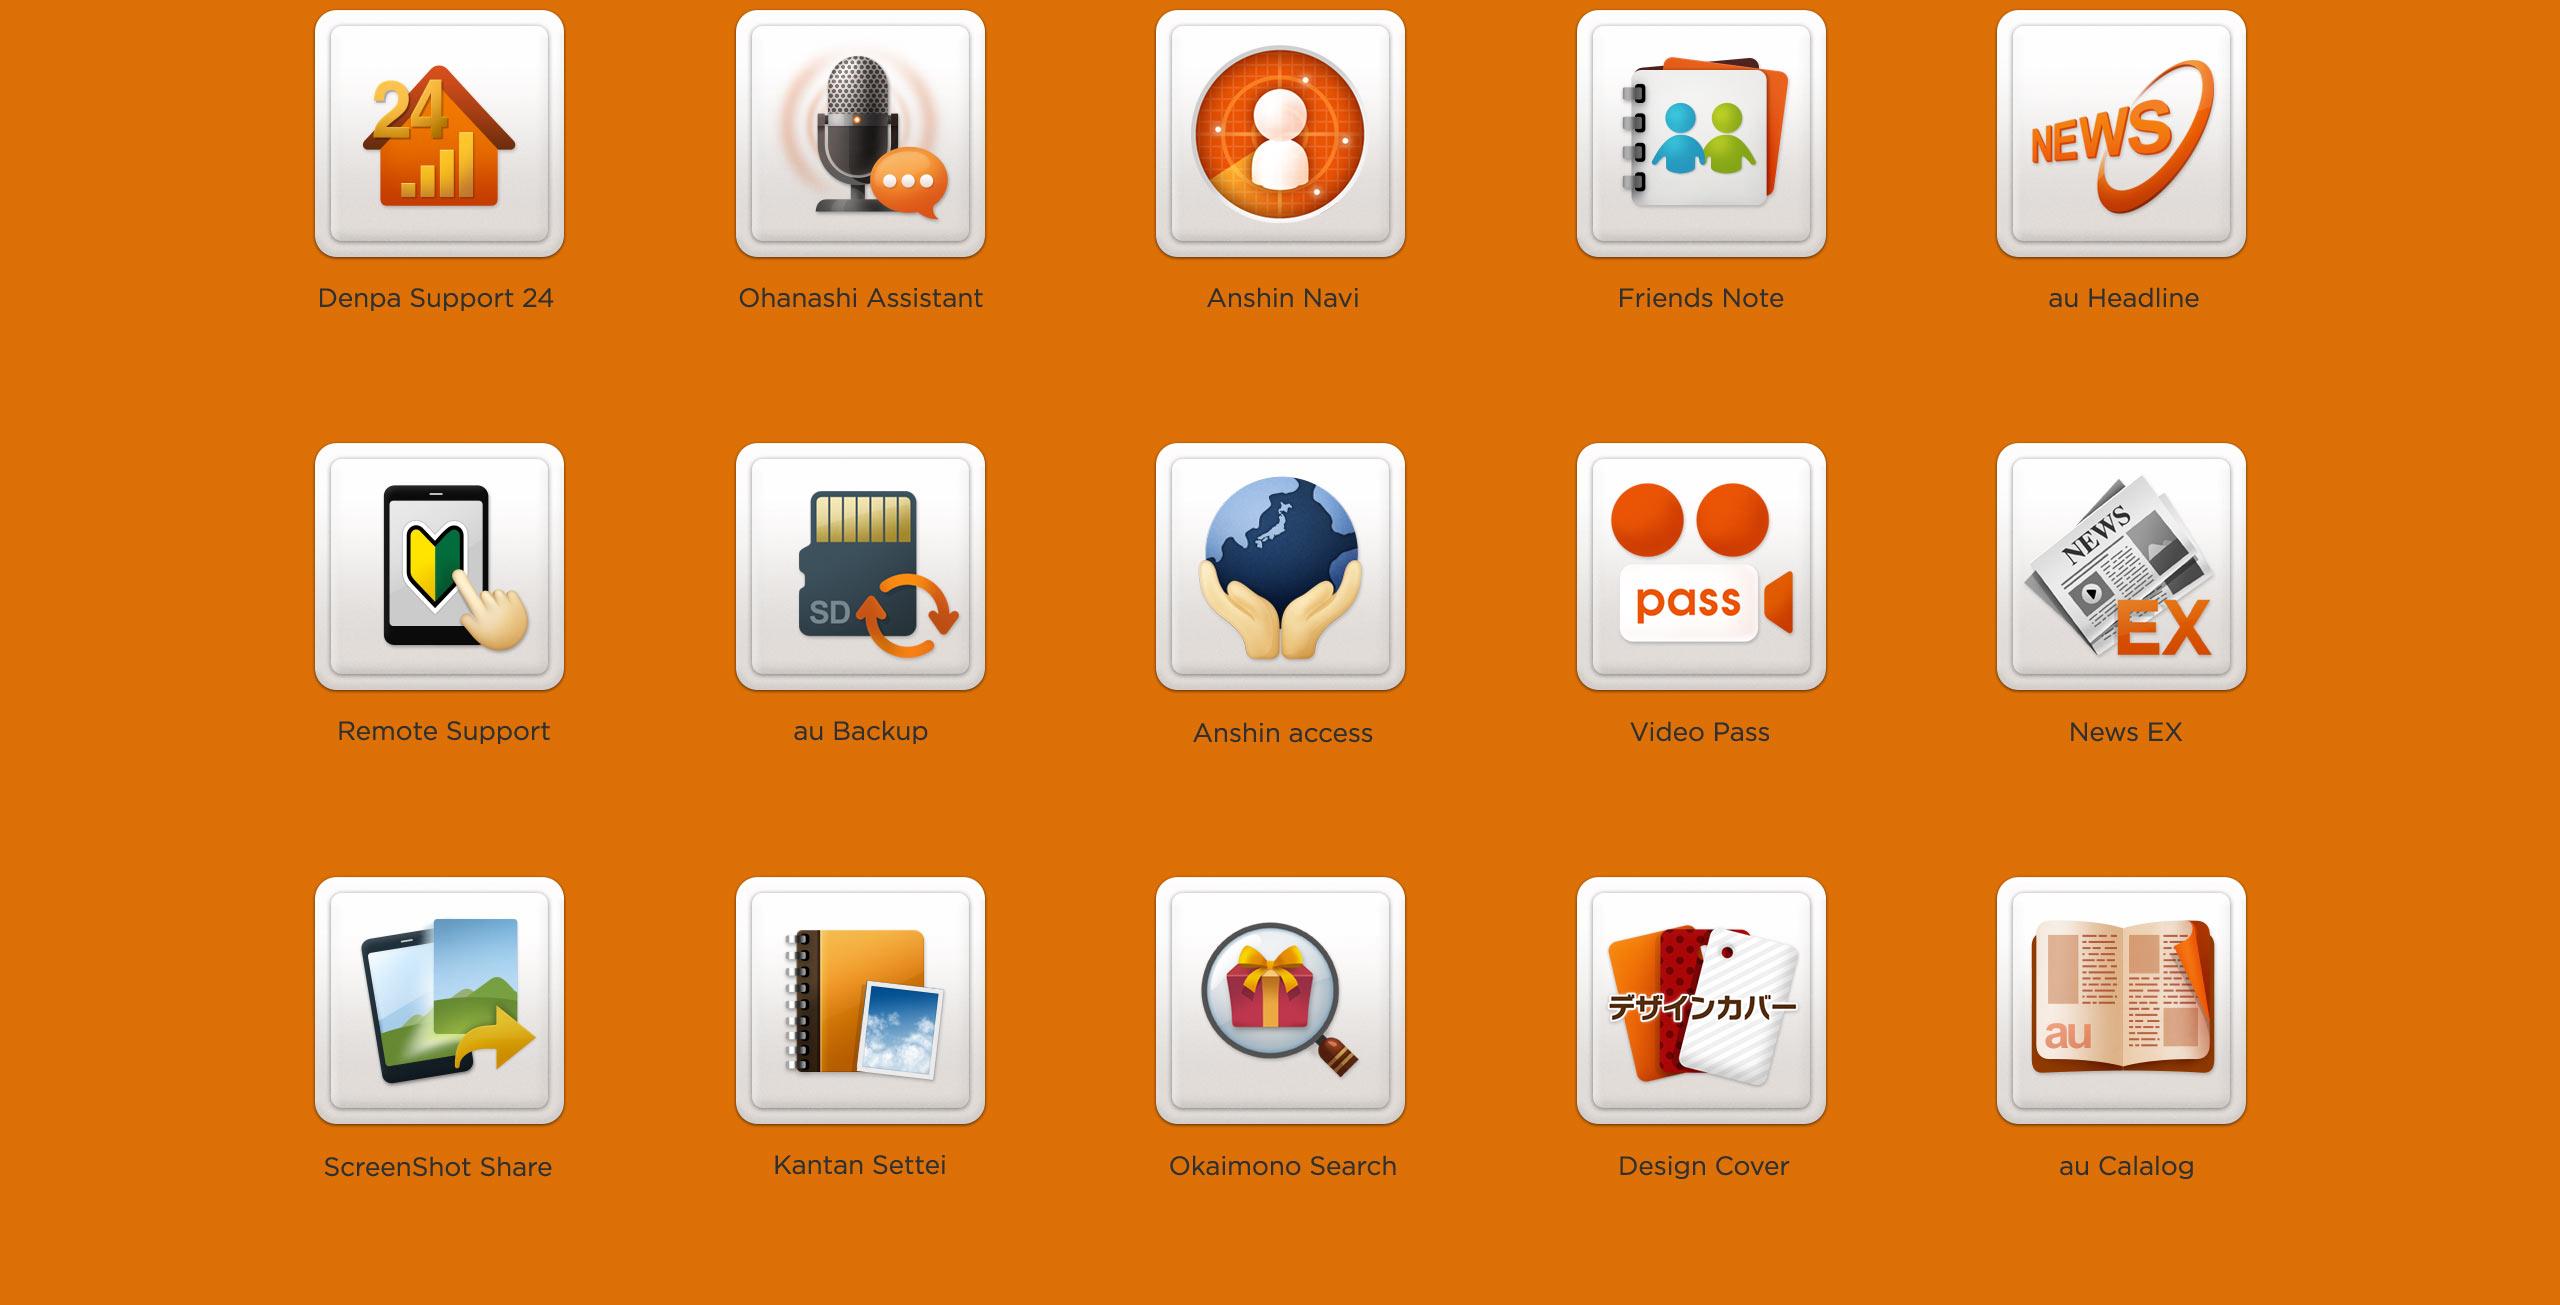 Hybridworks works au service icons 2013 2014